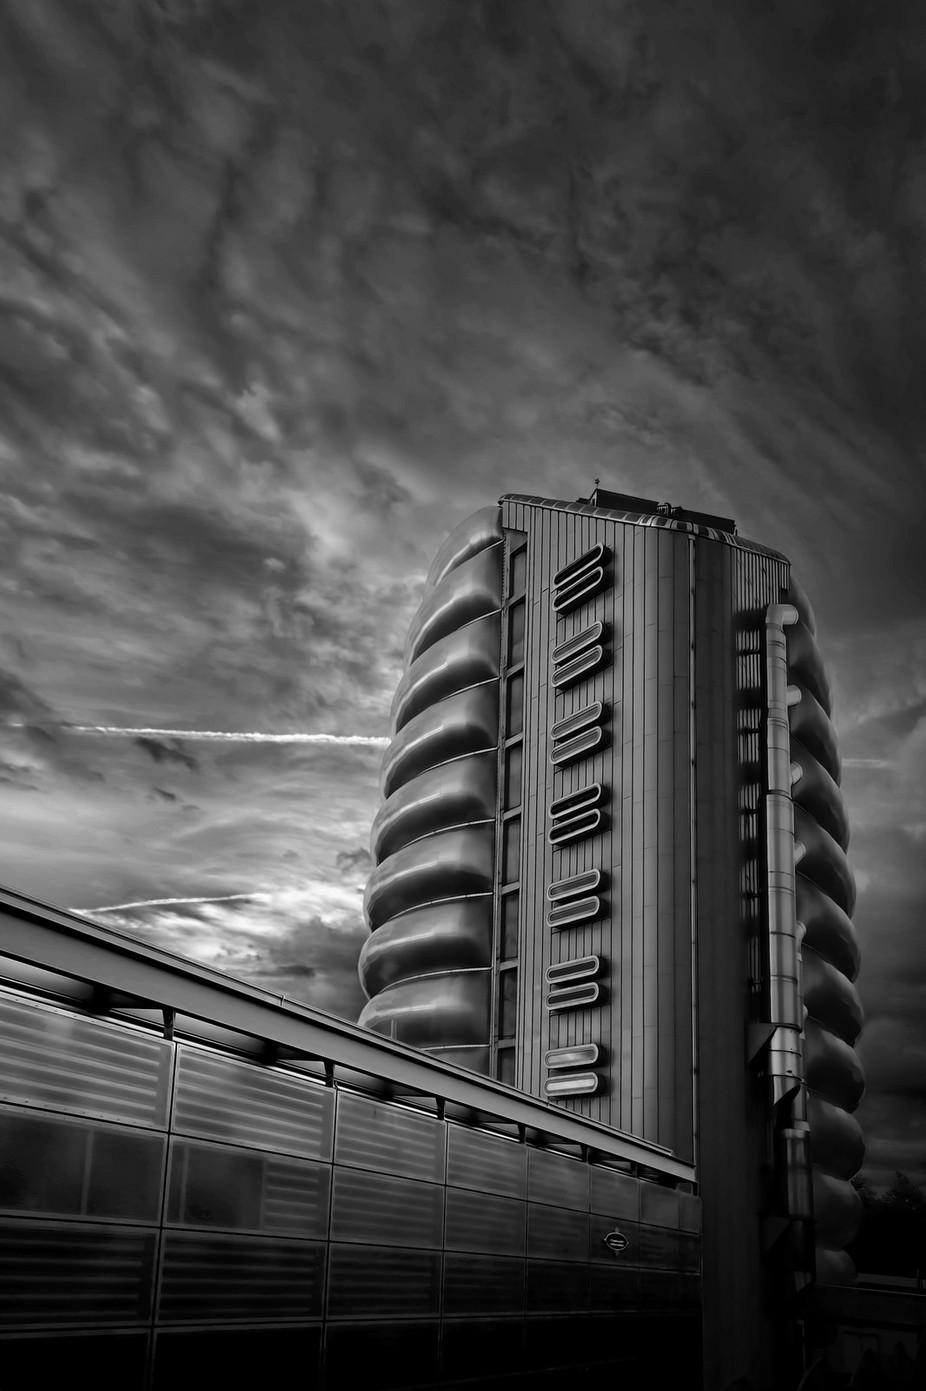 National Space Centre by RAPJones - Black And White Architecture Photo Contest